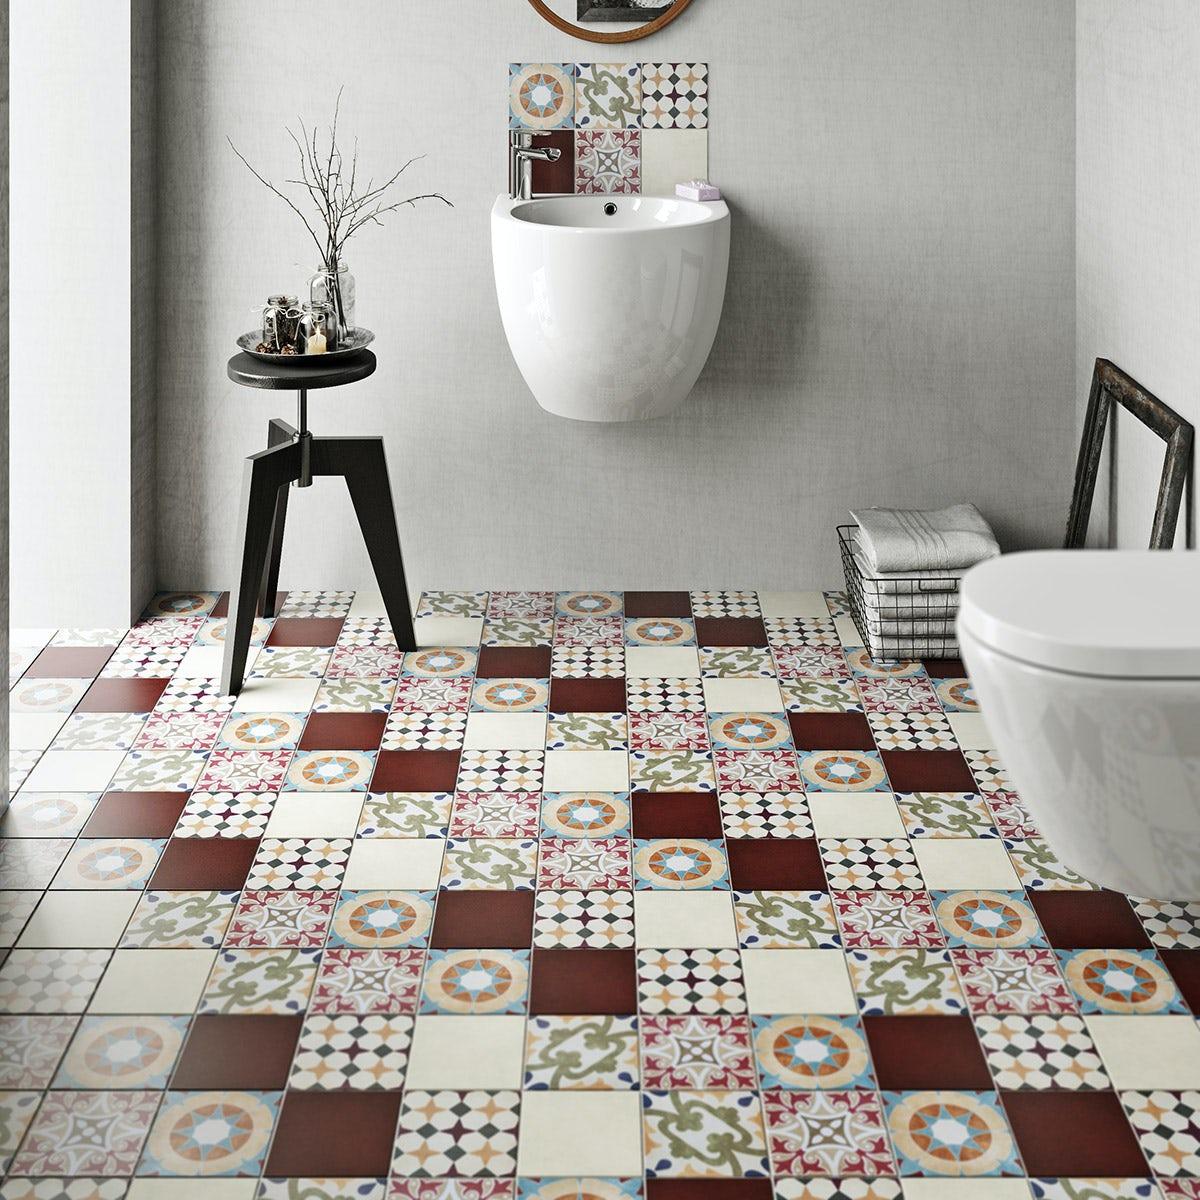 British Ceramic Tile Patchwork pattern multi colour matt tile 142mm x 142mm